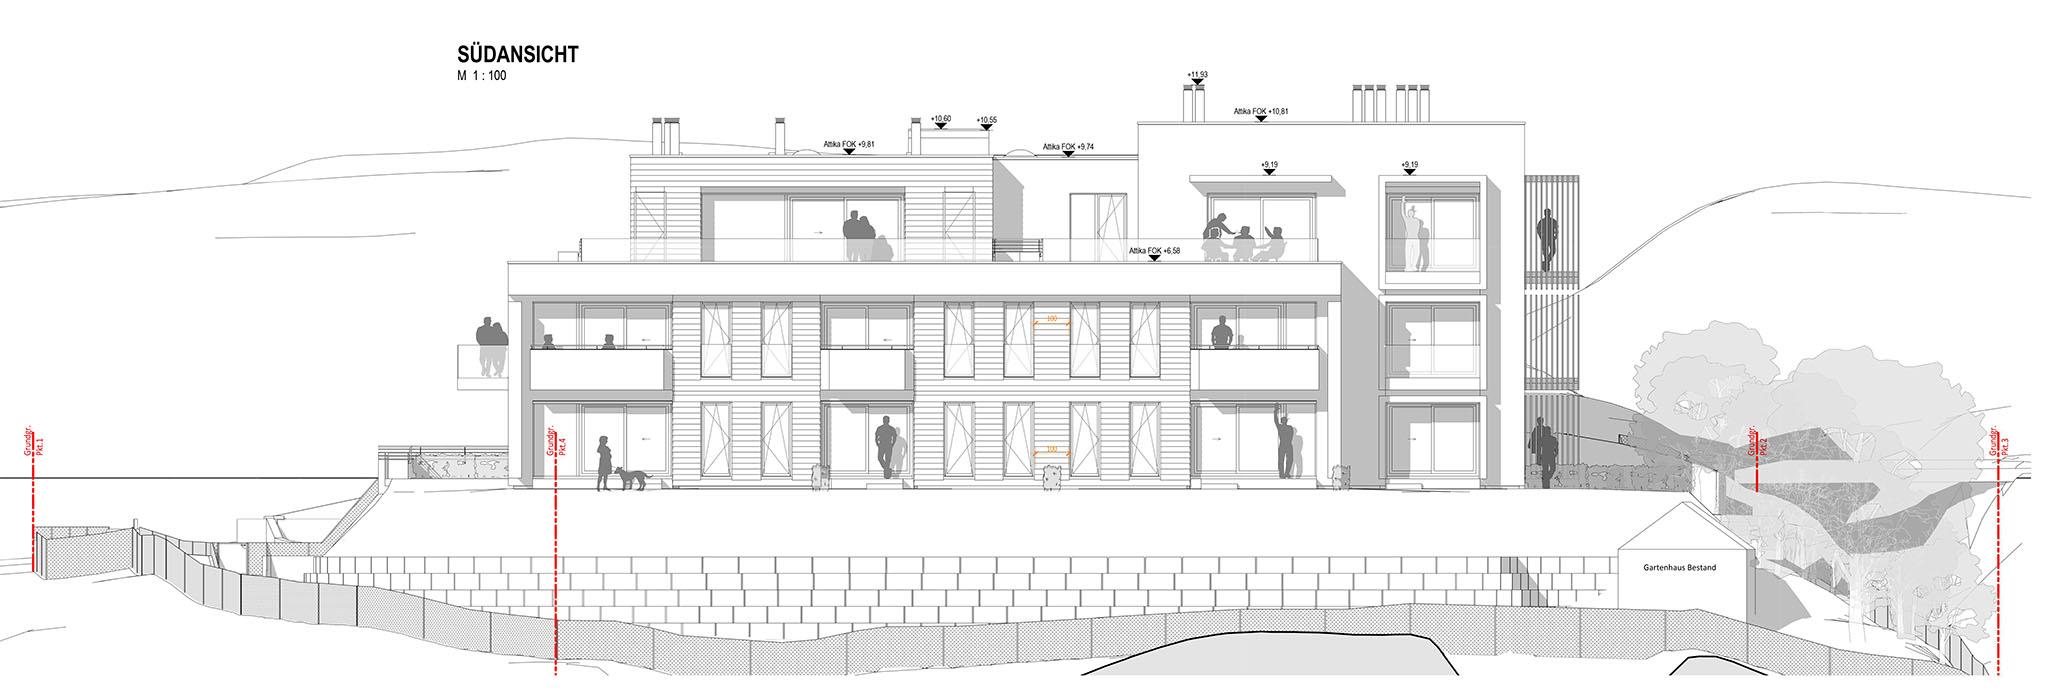 Planung mittels Building Information Modelling (BIM)